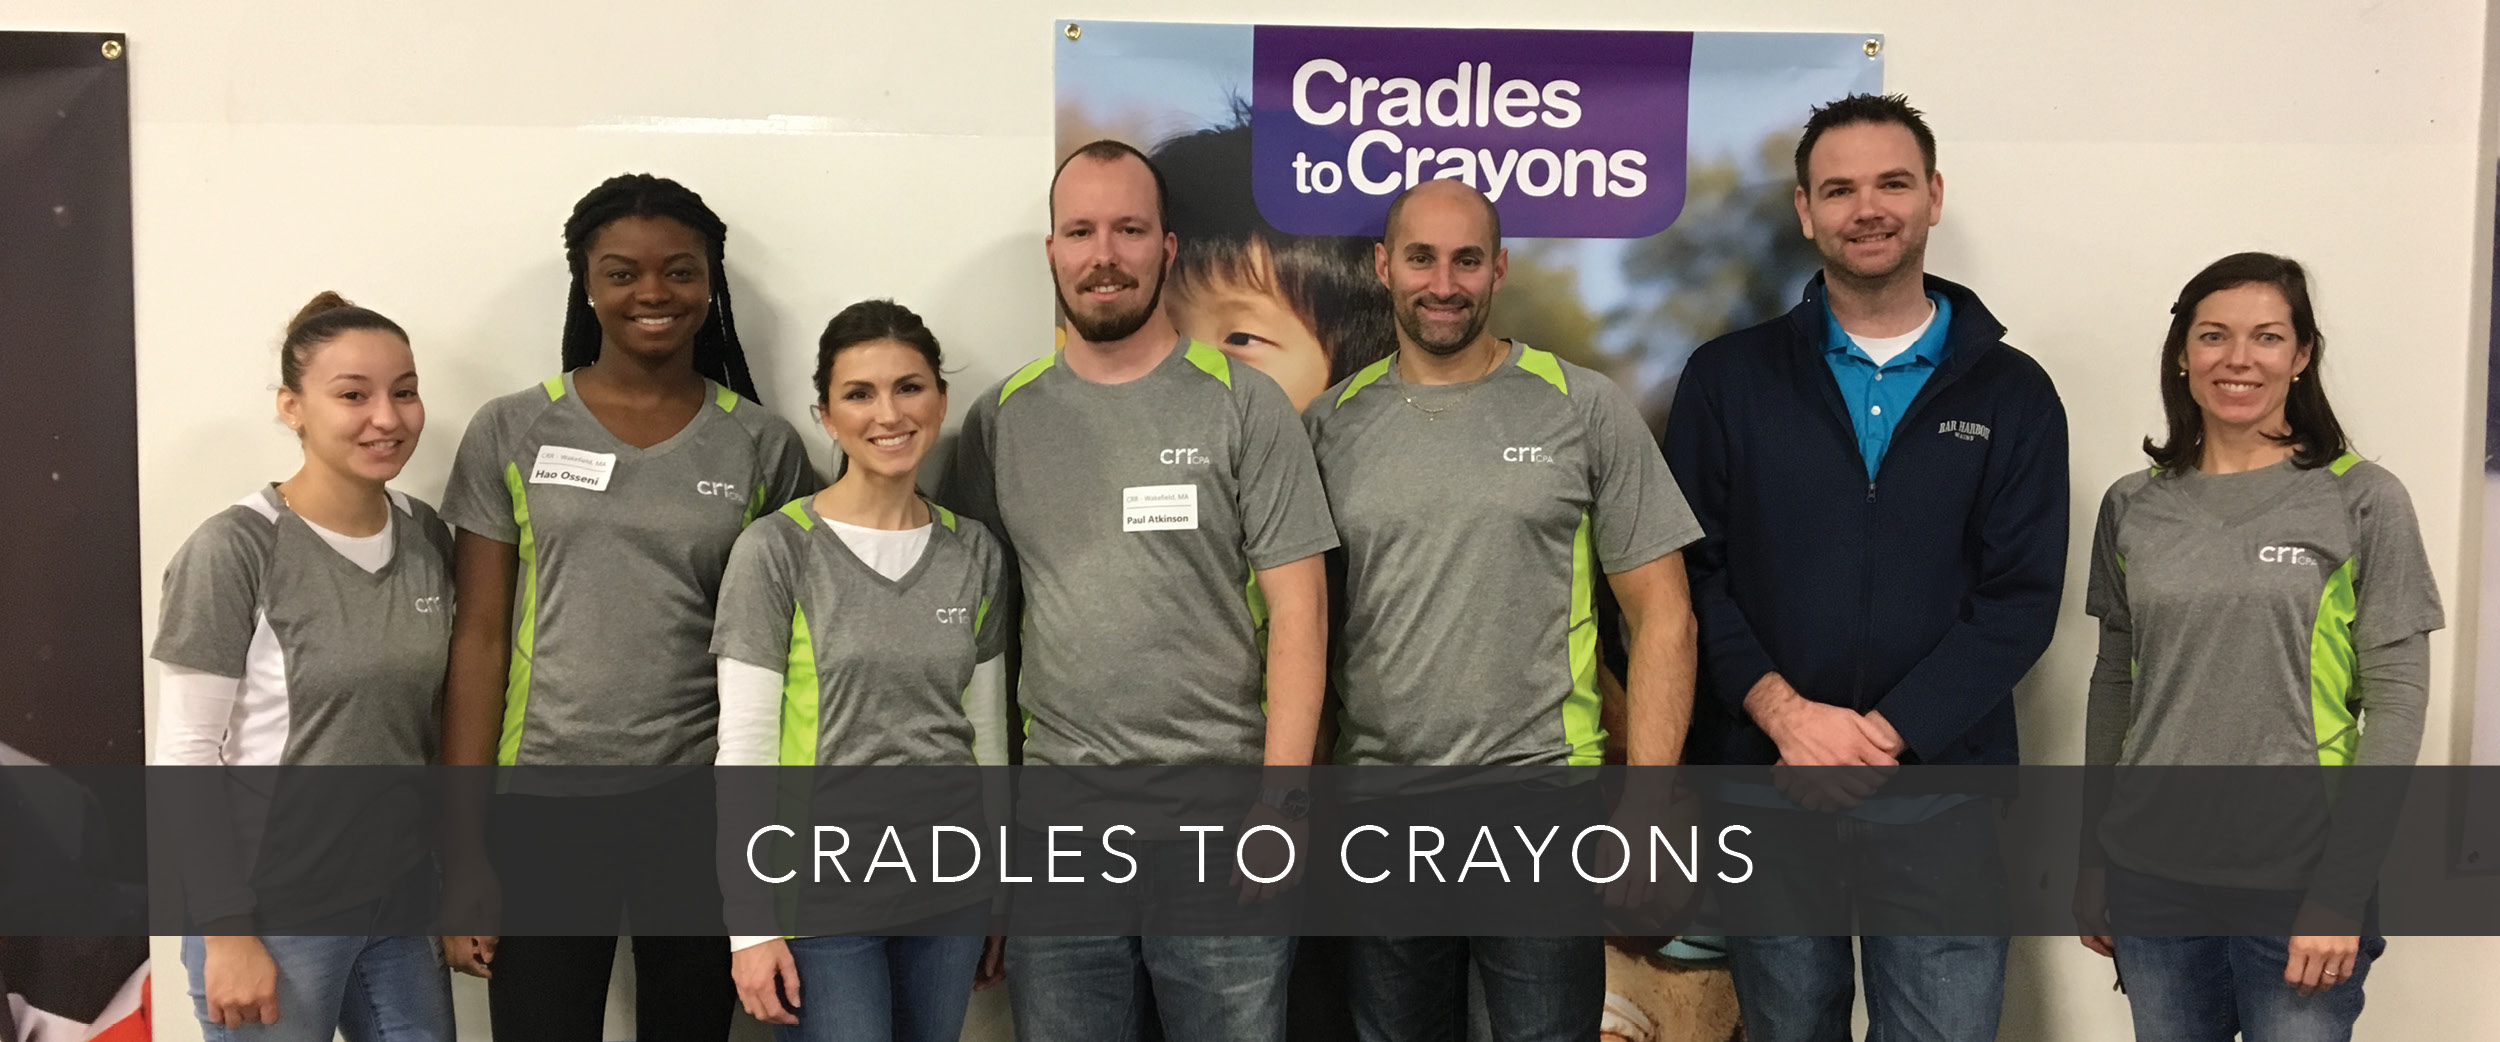 slider-2018-Cradles-to-Crayons